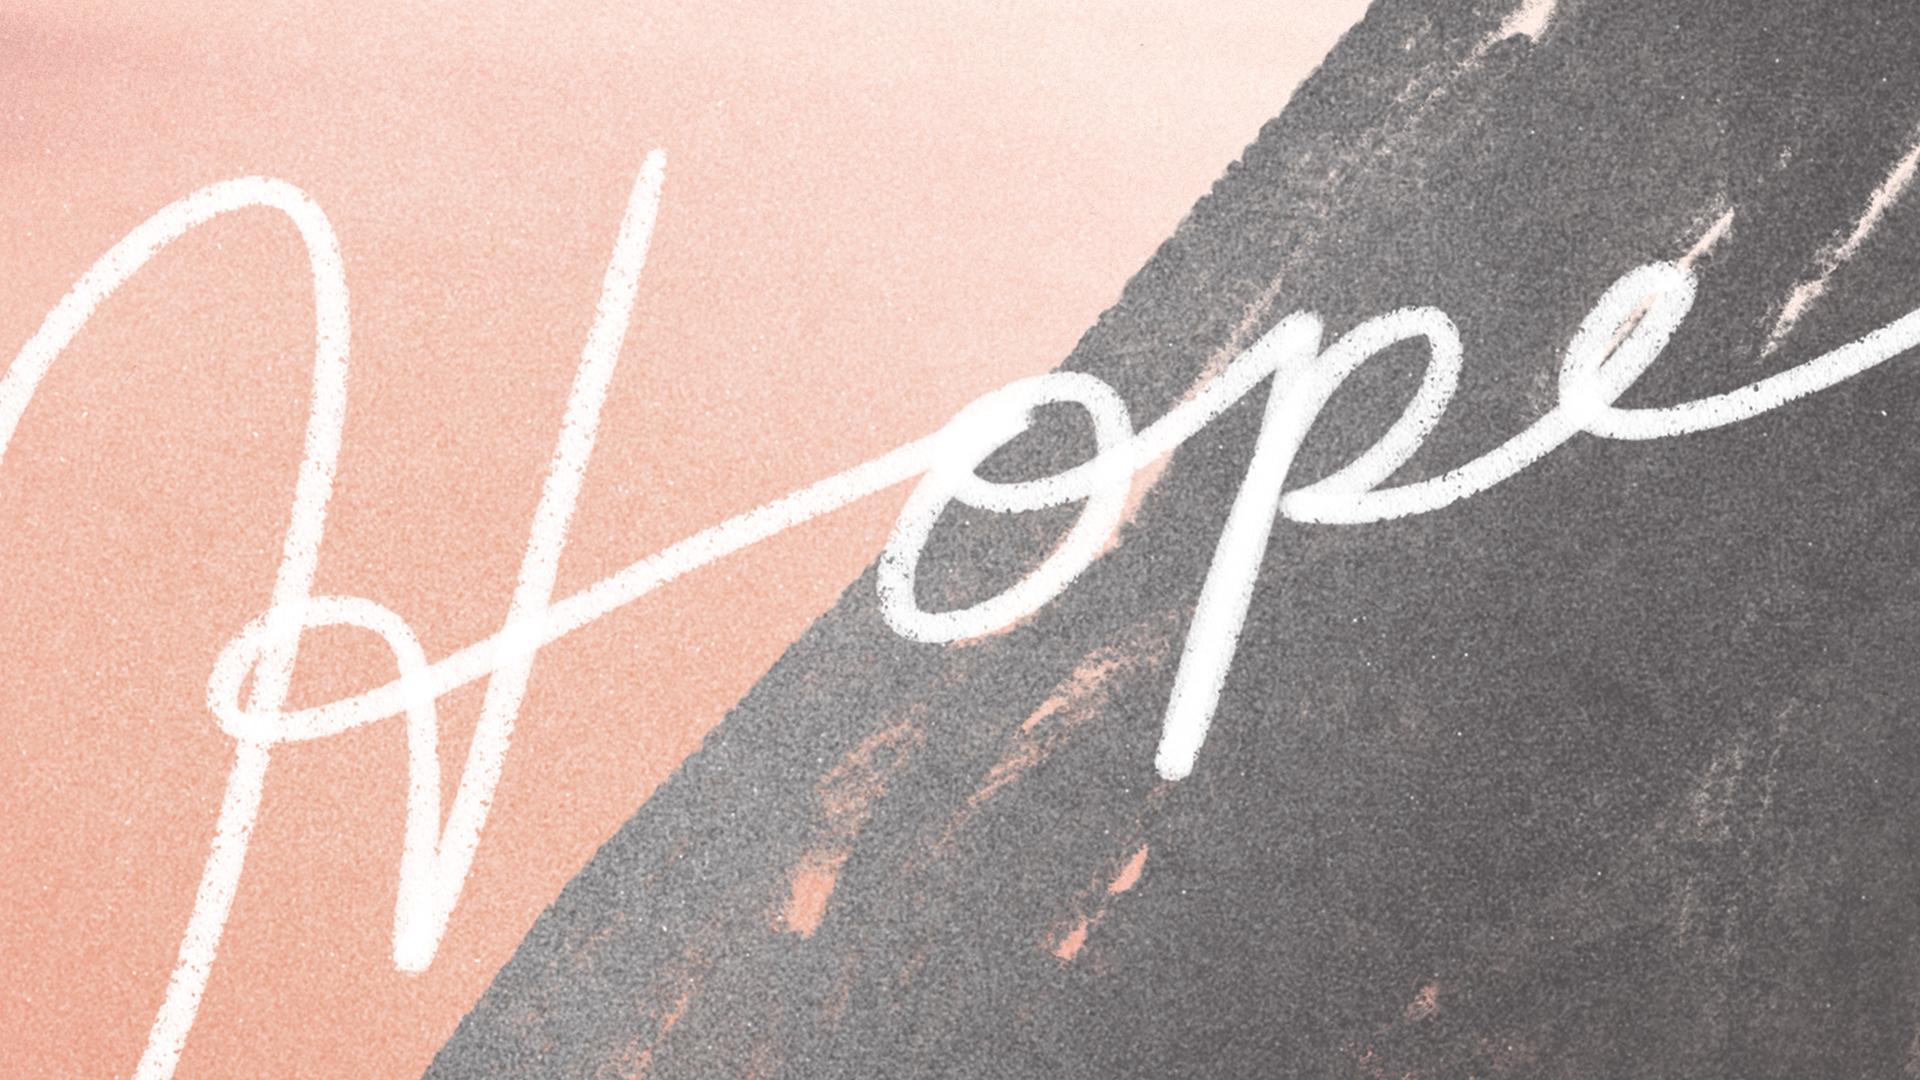 Hope-1920x1080.jpg